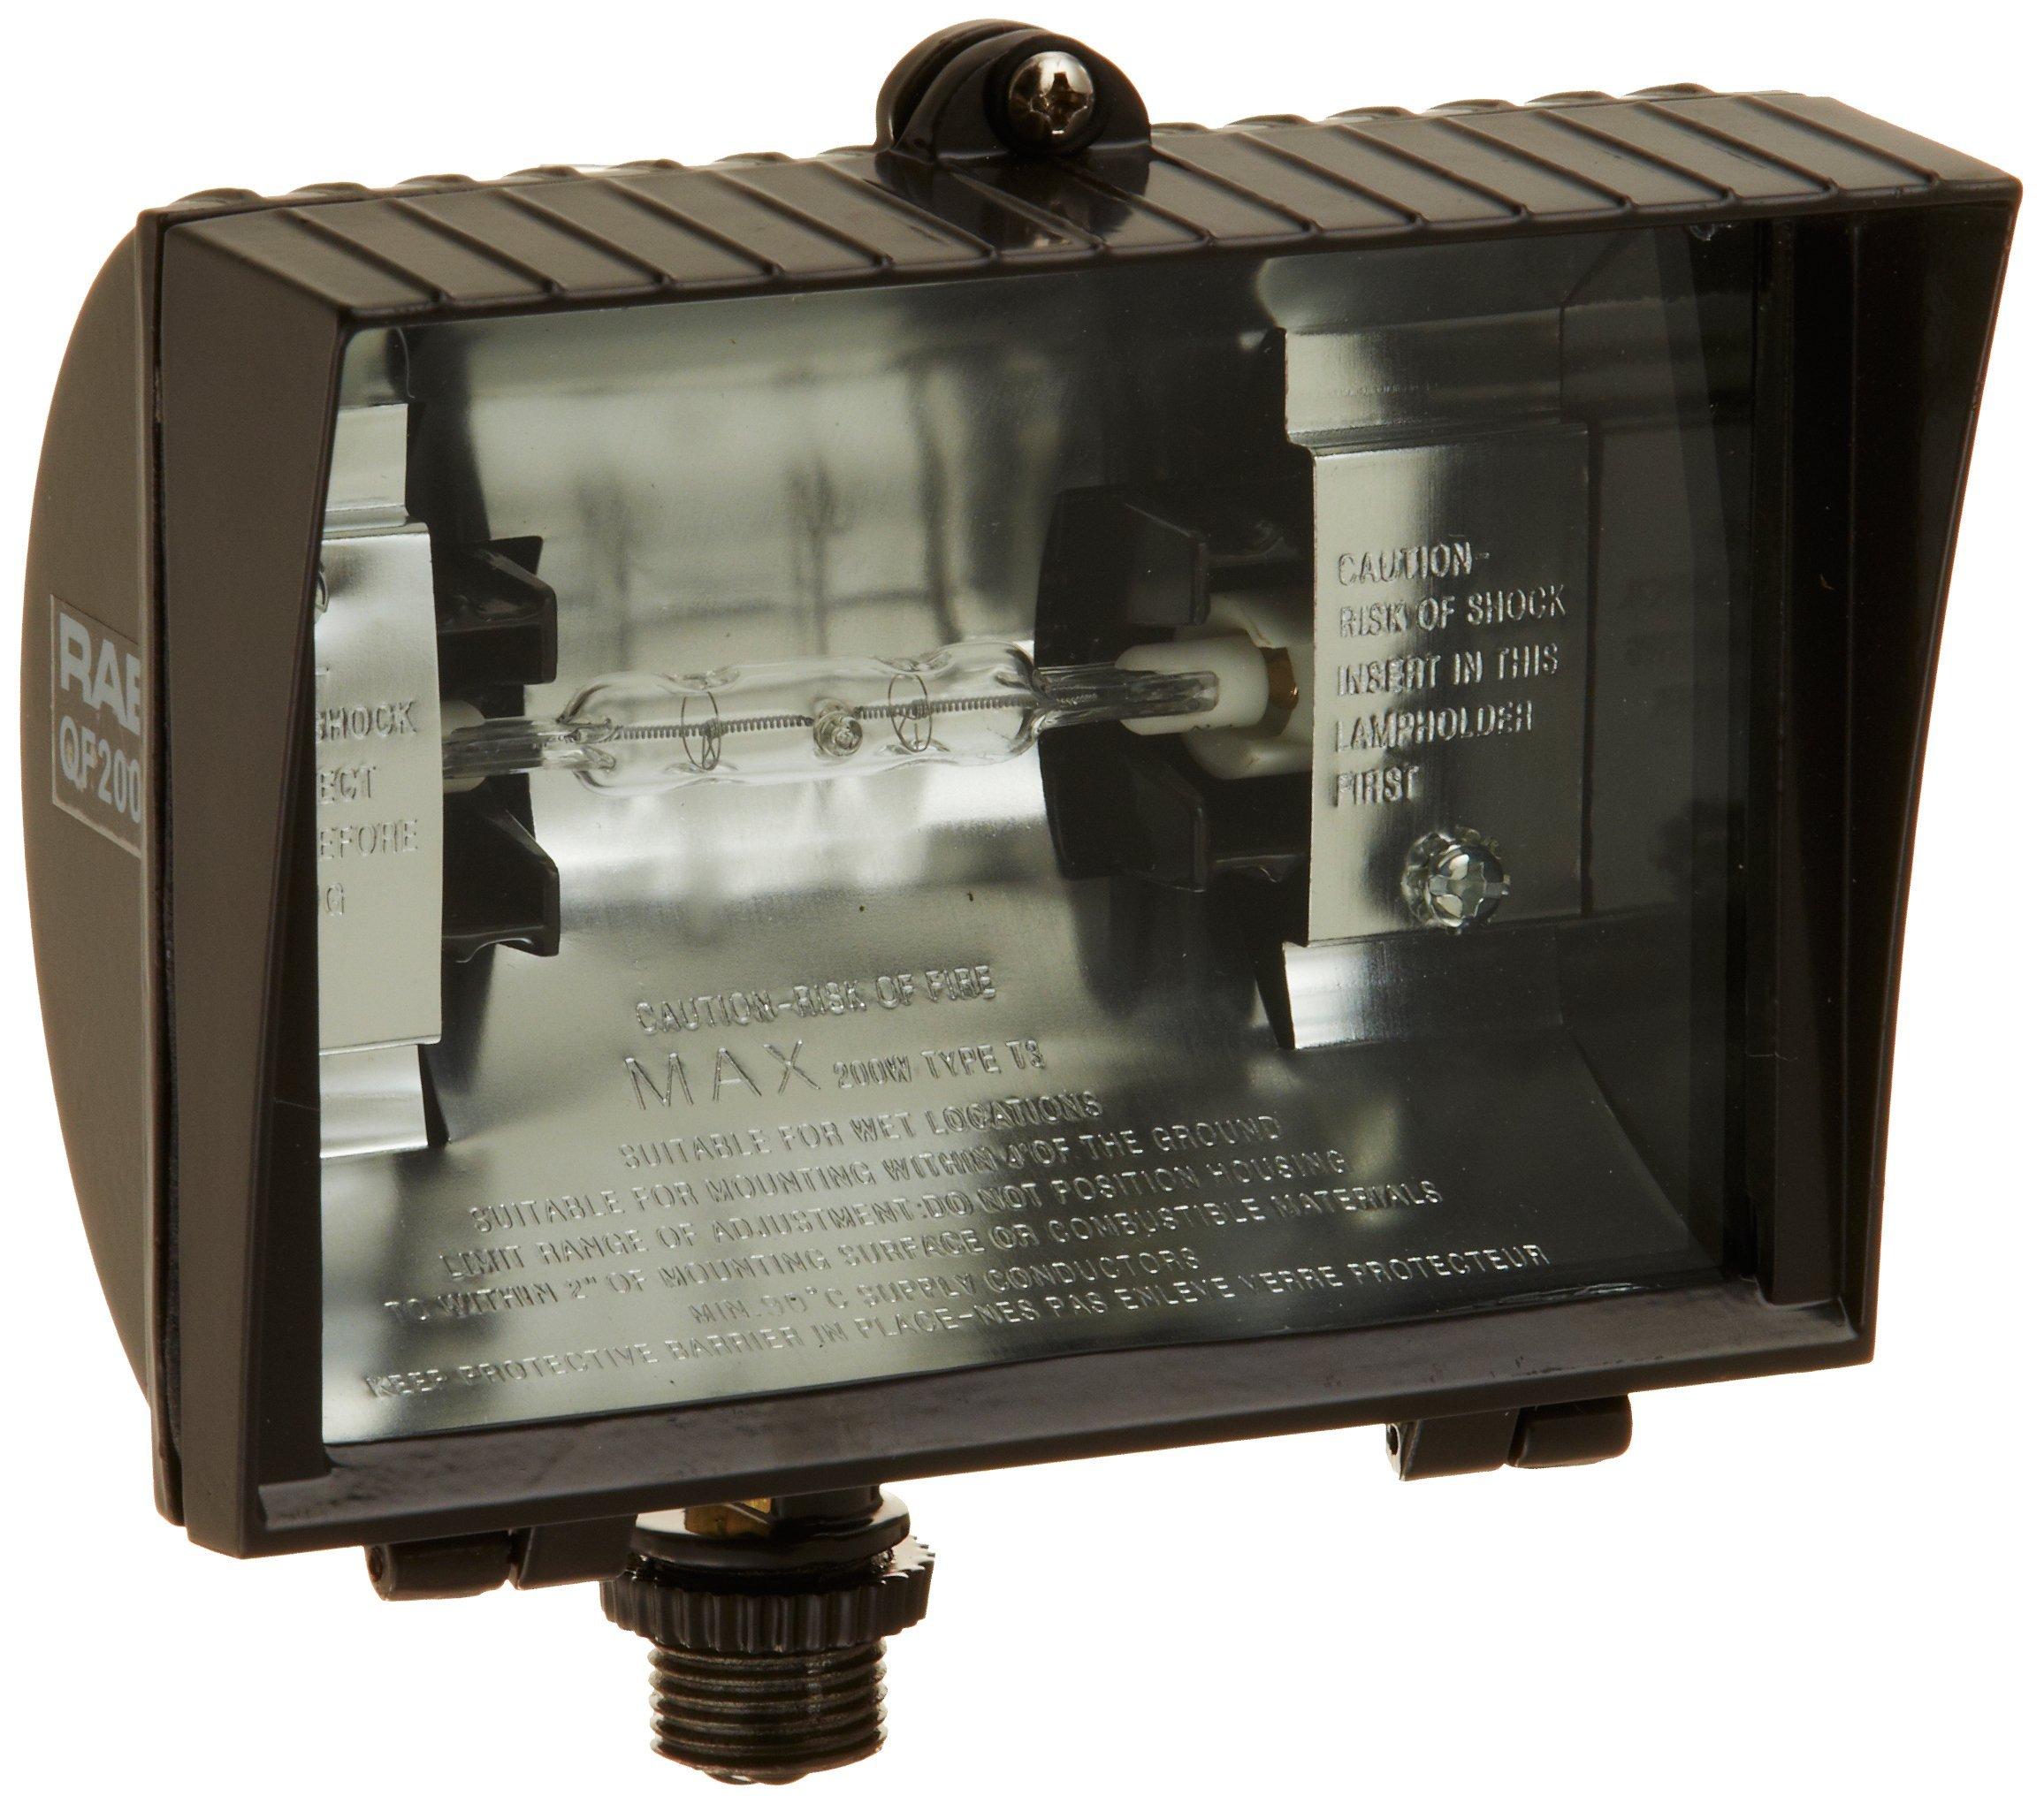 RAB Lighting QF200F Quartz Curve Floodlight, Aluminum, 200W Power, 3600 Lumens, 120V, Bronze